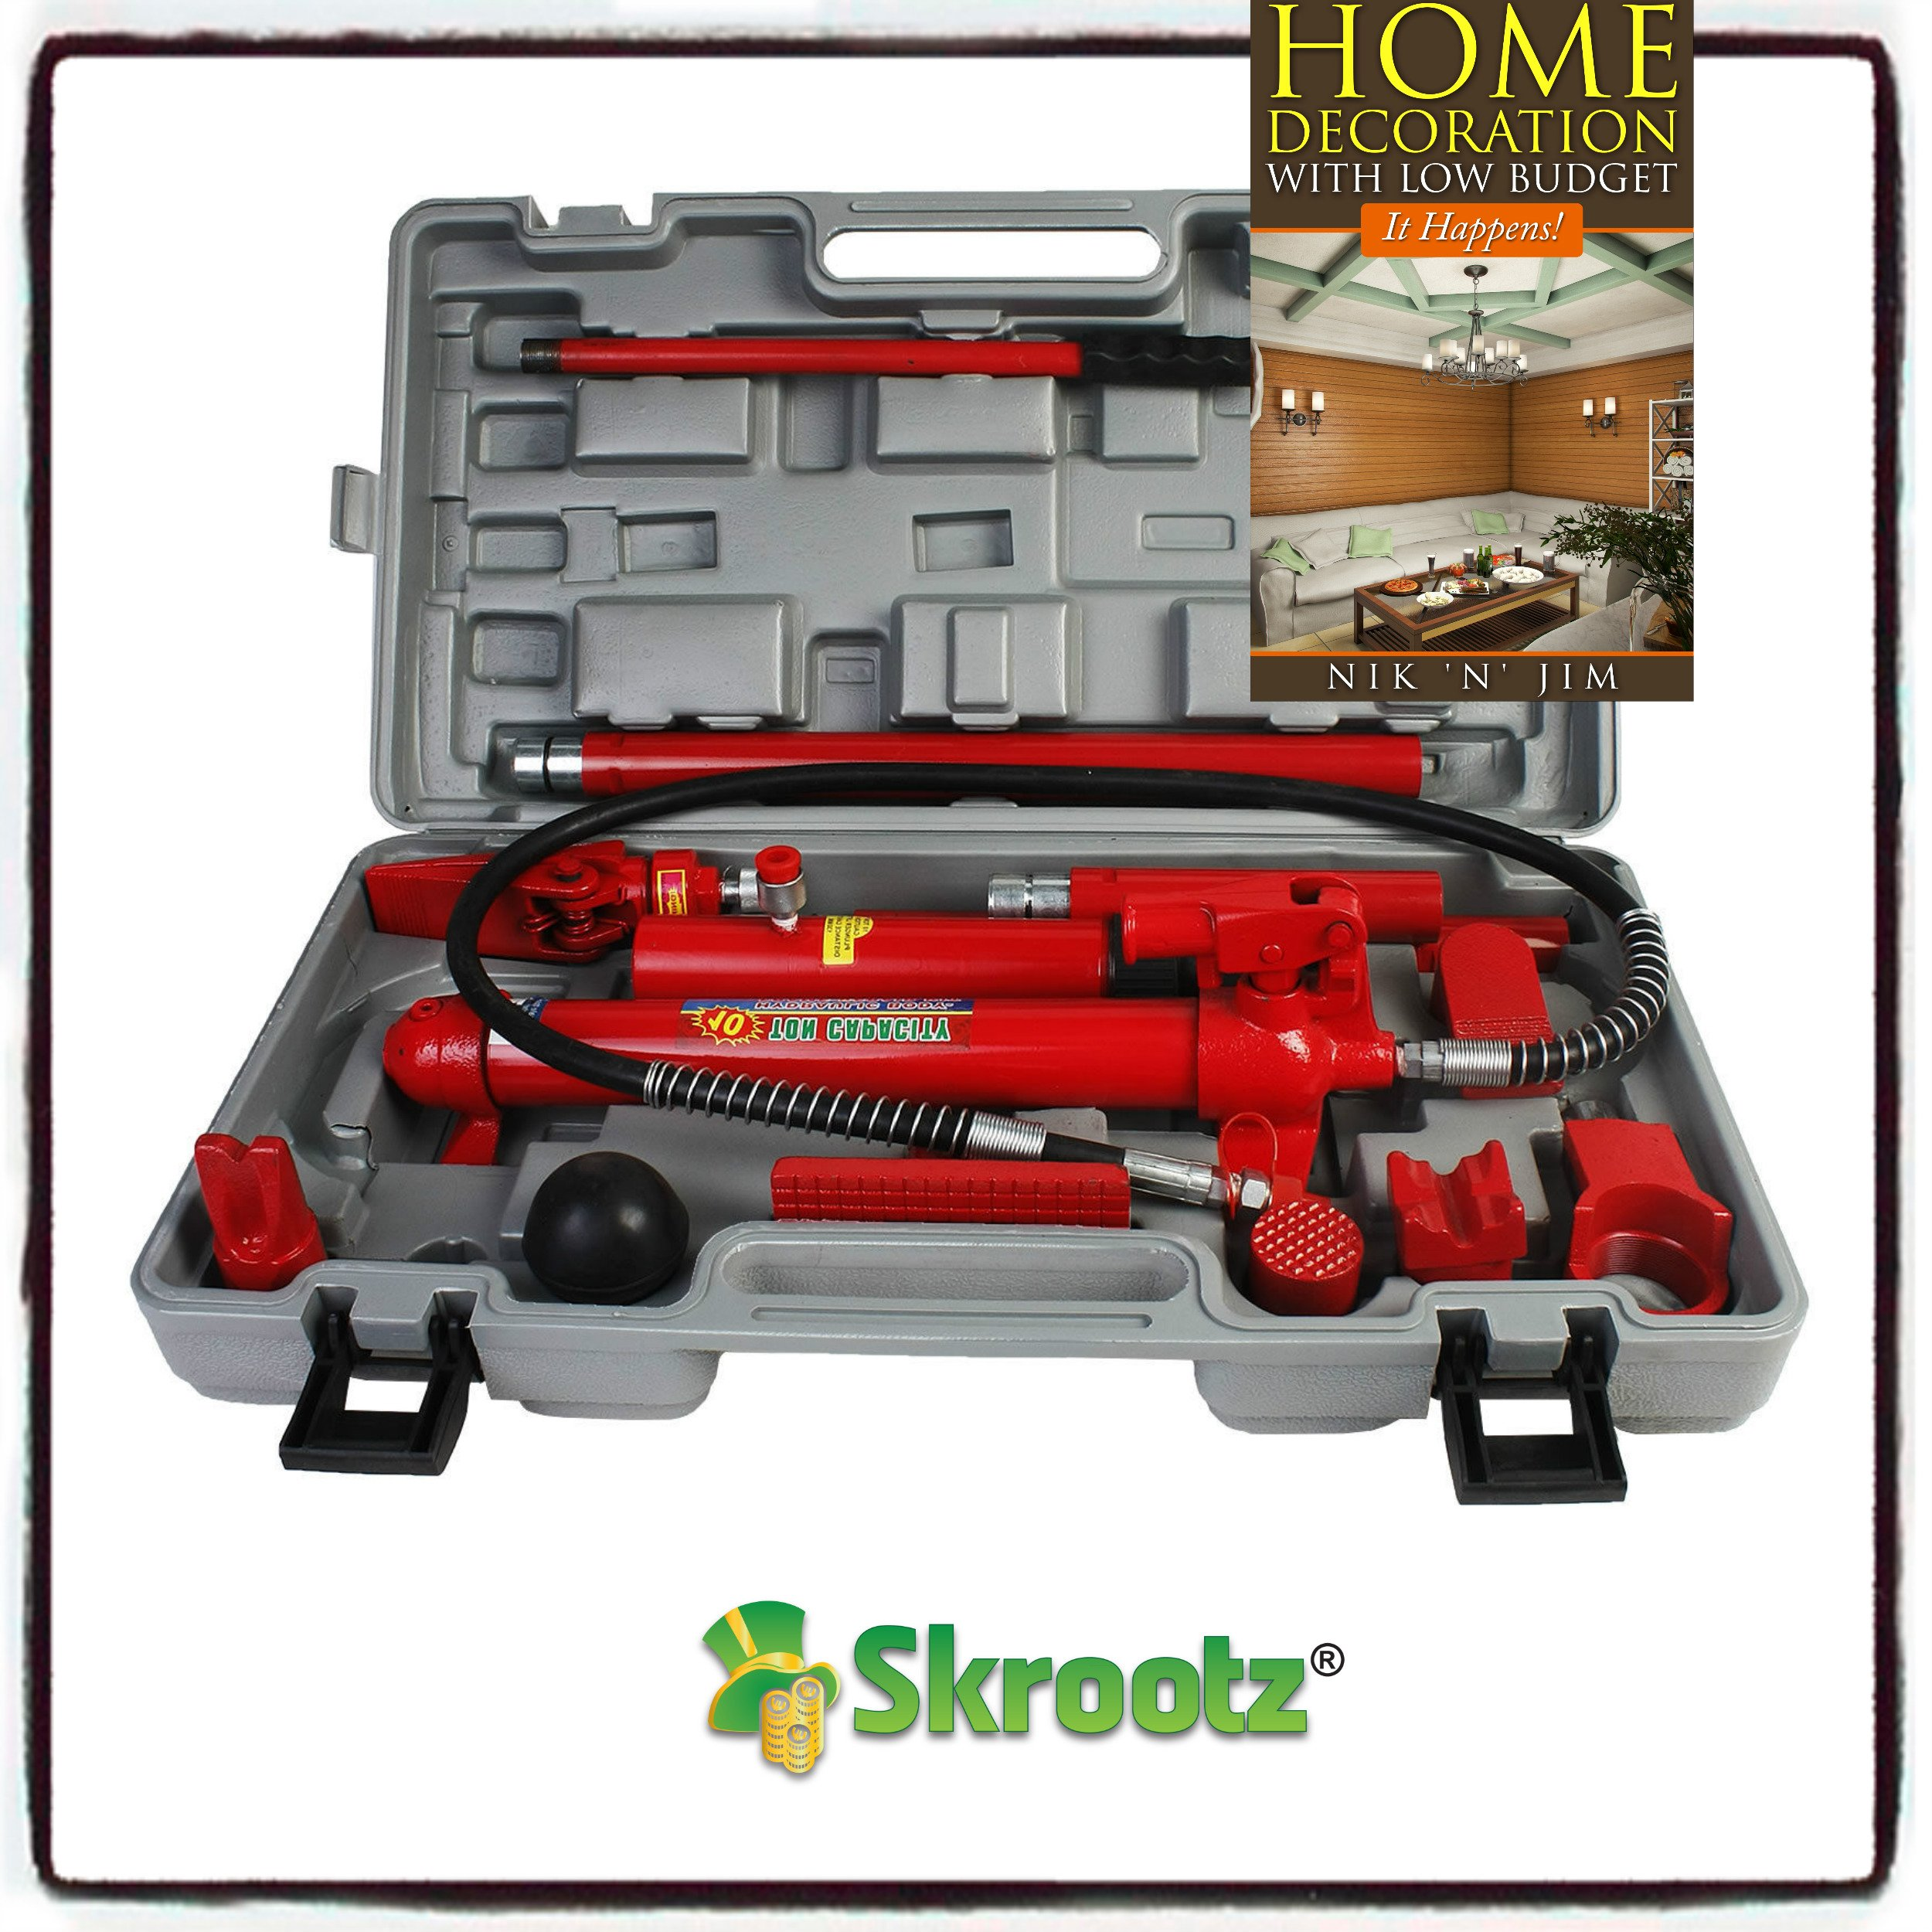 10 Ton Porta Power Hydraulic Jack Body Frame Repair Kit Auto Shop Tool Heavy Set by Skroutz